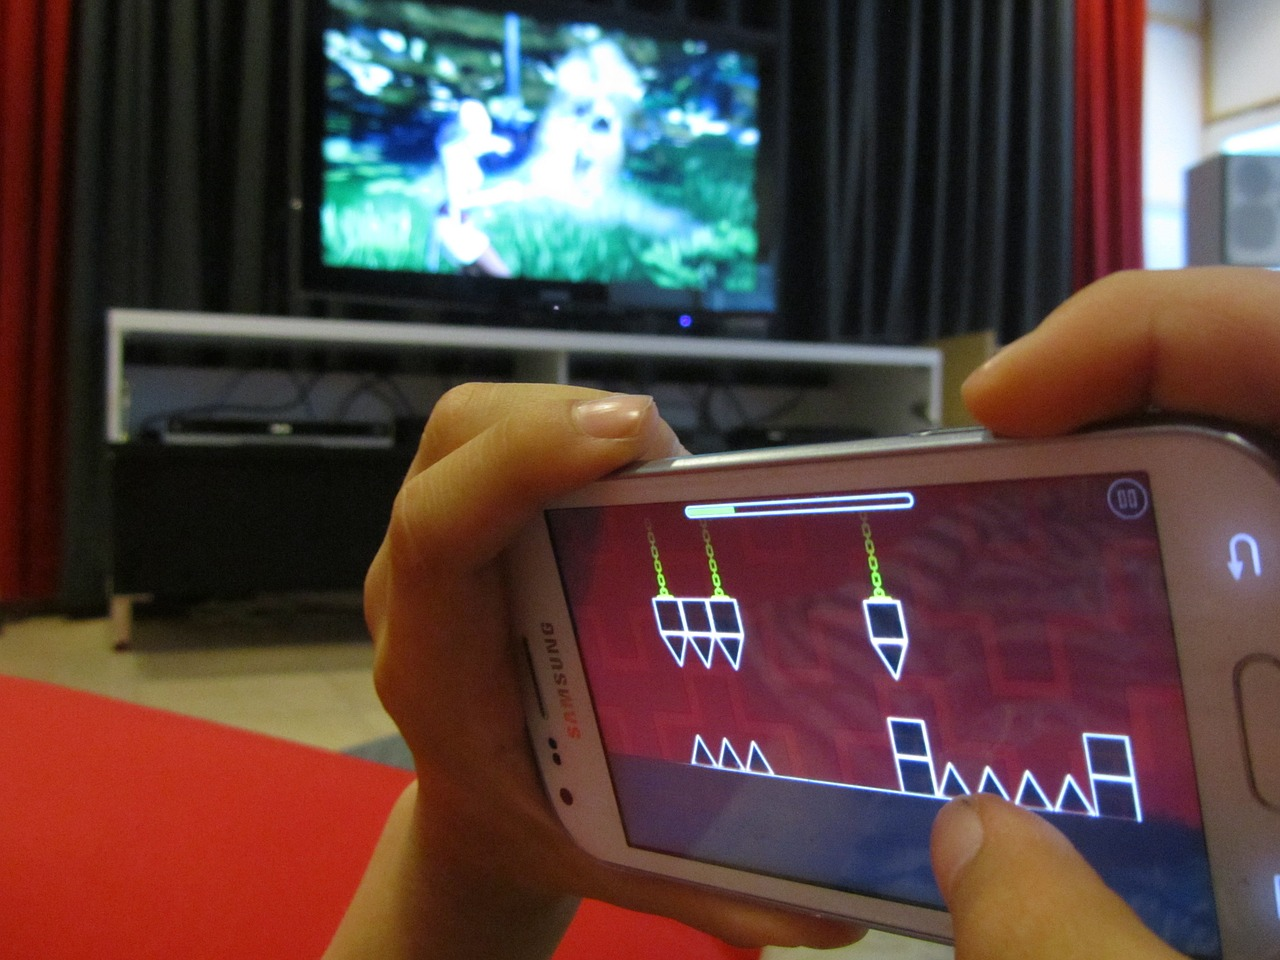 smartfon dla dziecka gra